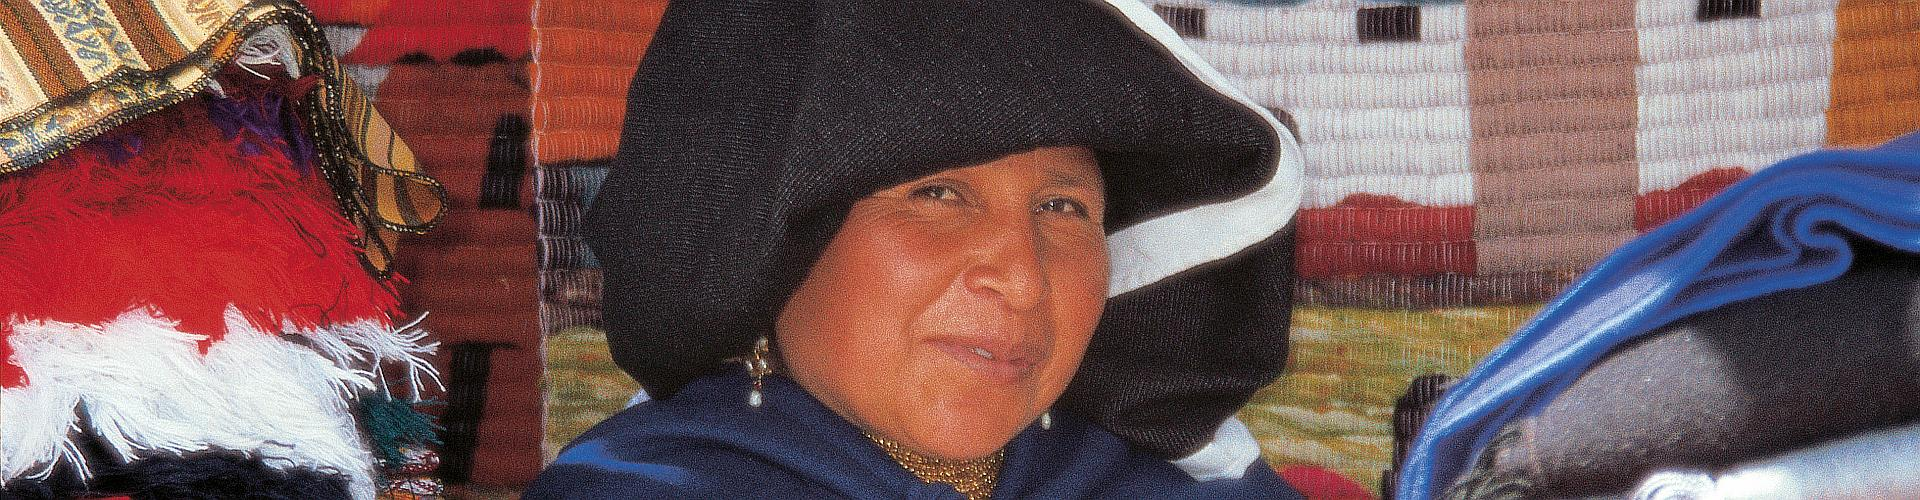 Ecuador Rundreise mit Bavaria Fernreisen